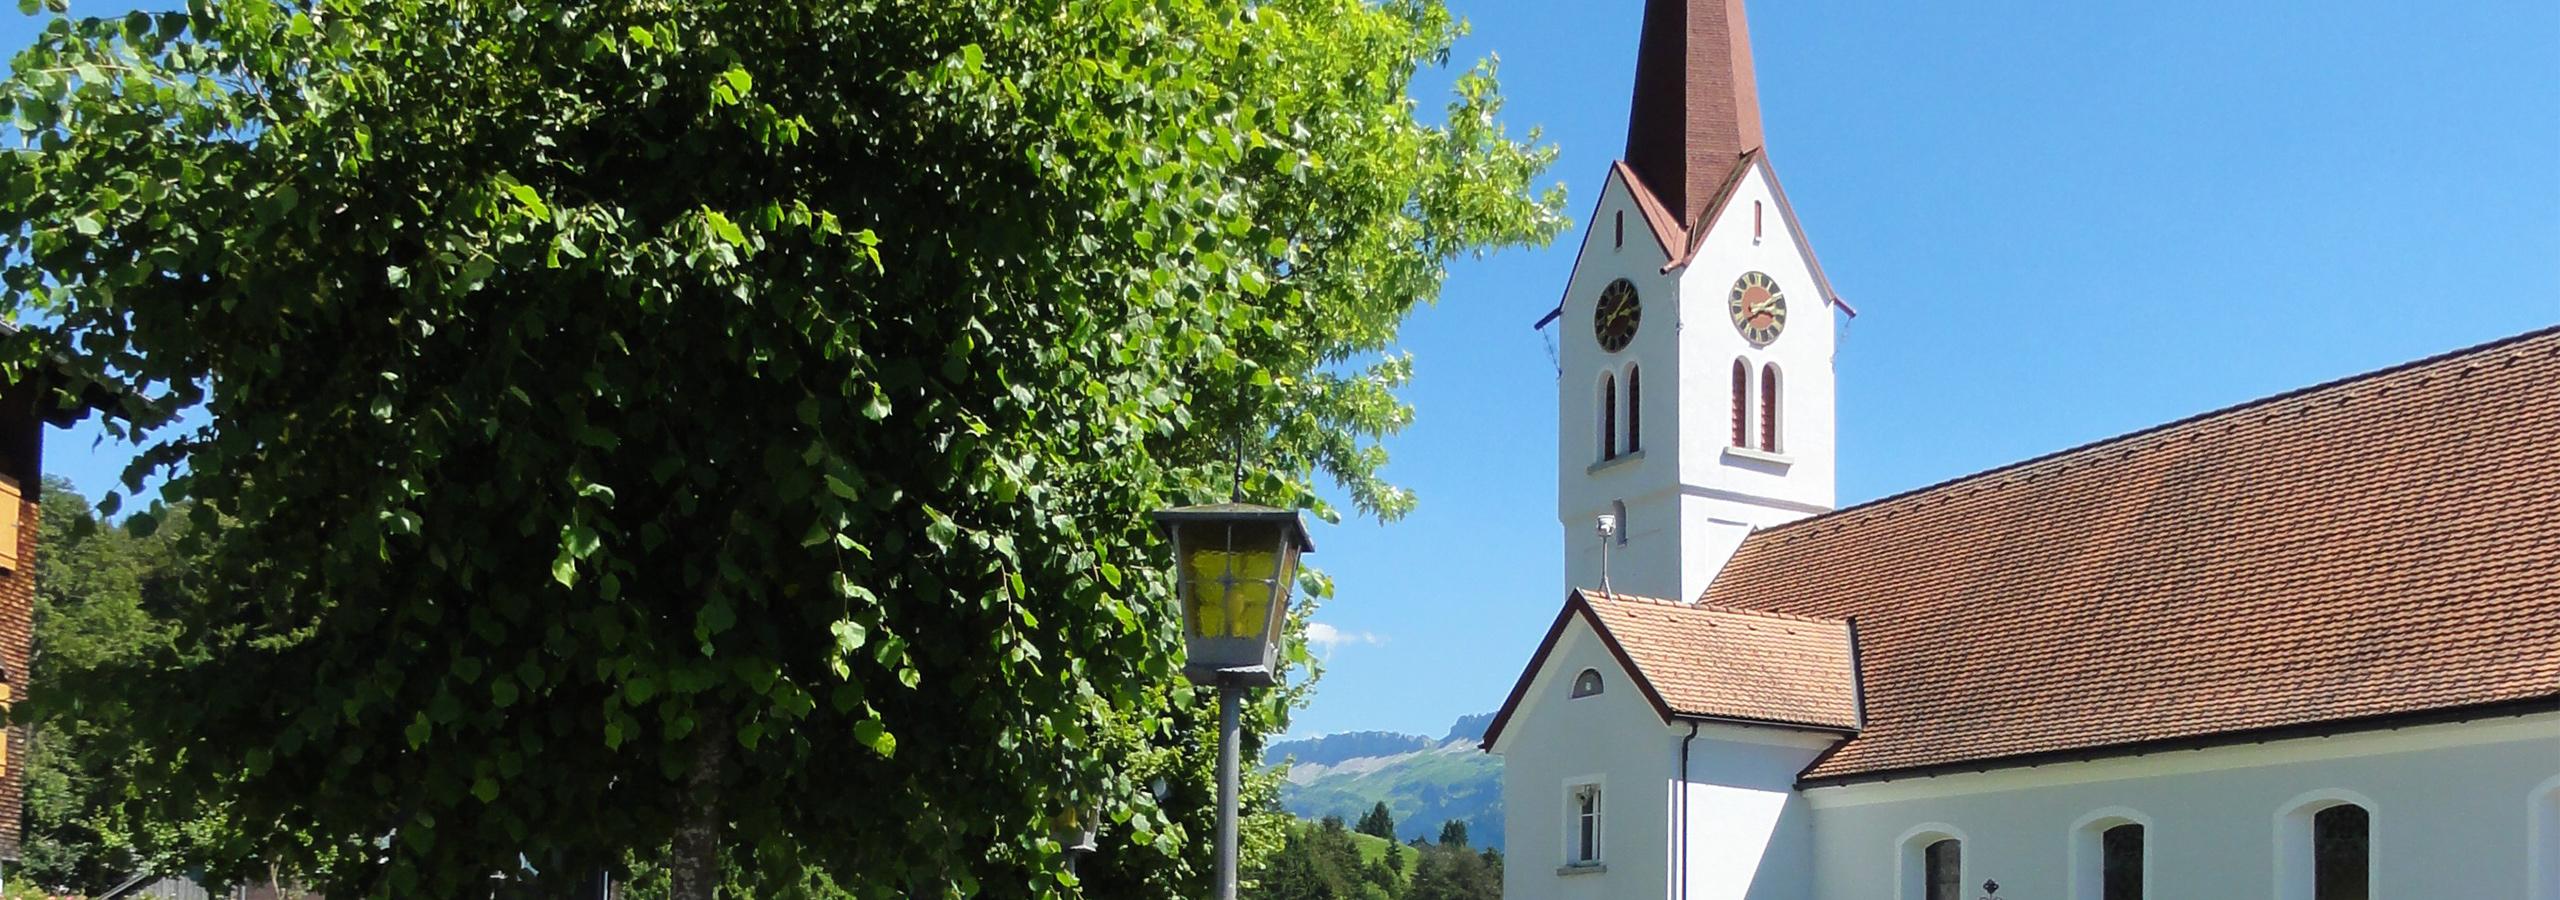 Lebensader Dorf